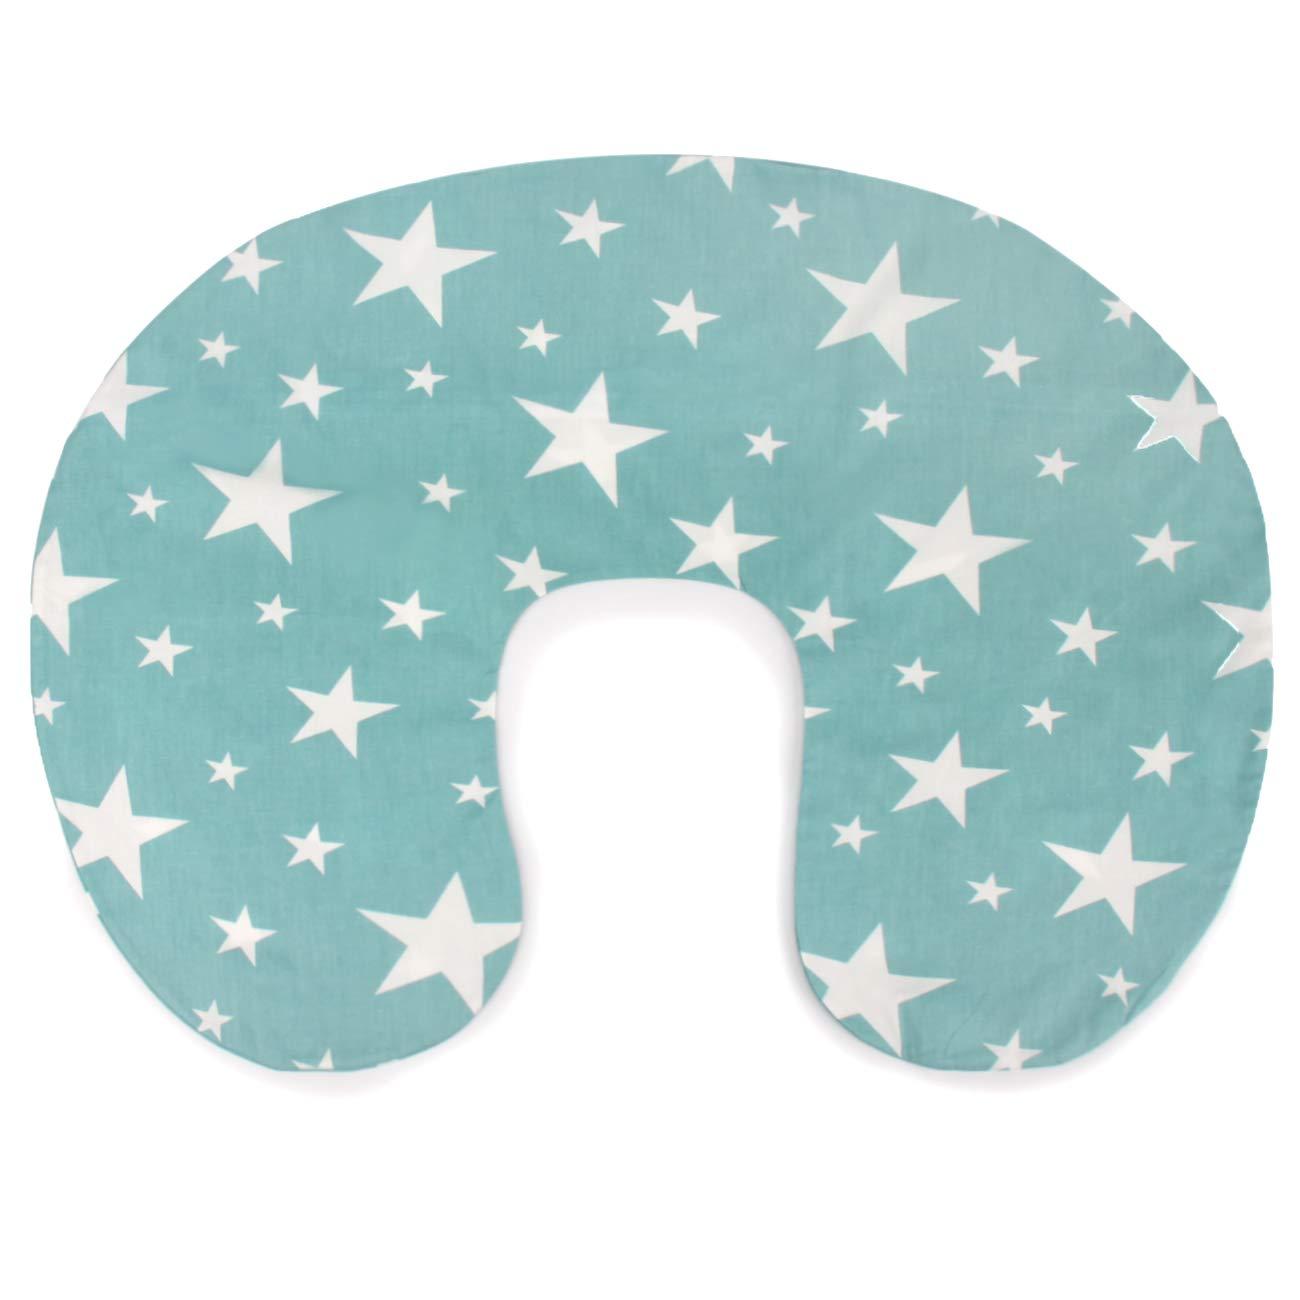 PEKITAS Breastfeeding Nursing Pillow Slipcover 20x16x5.5 Inches 100/% Cotton Breathable Anti-Suffocation Tucked Zipper Machine Washable Cartoon Beige